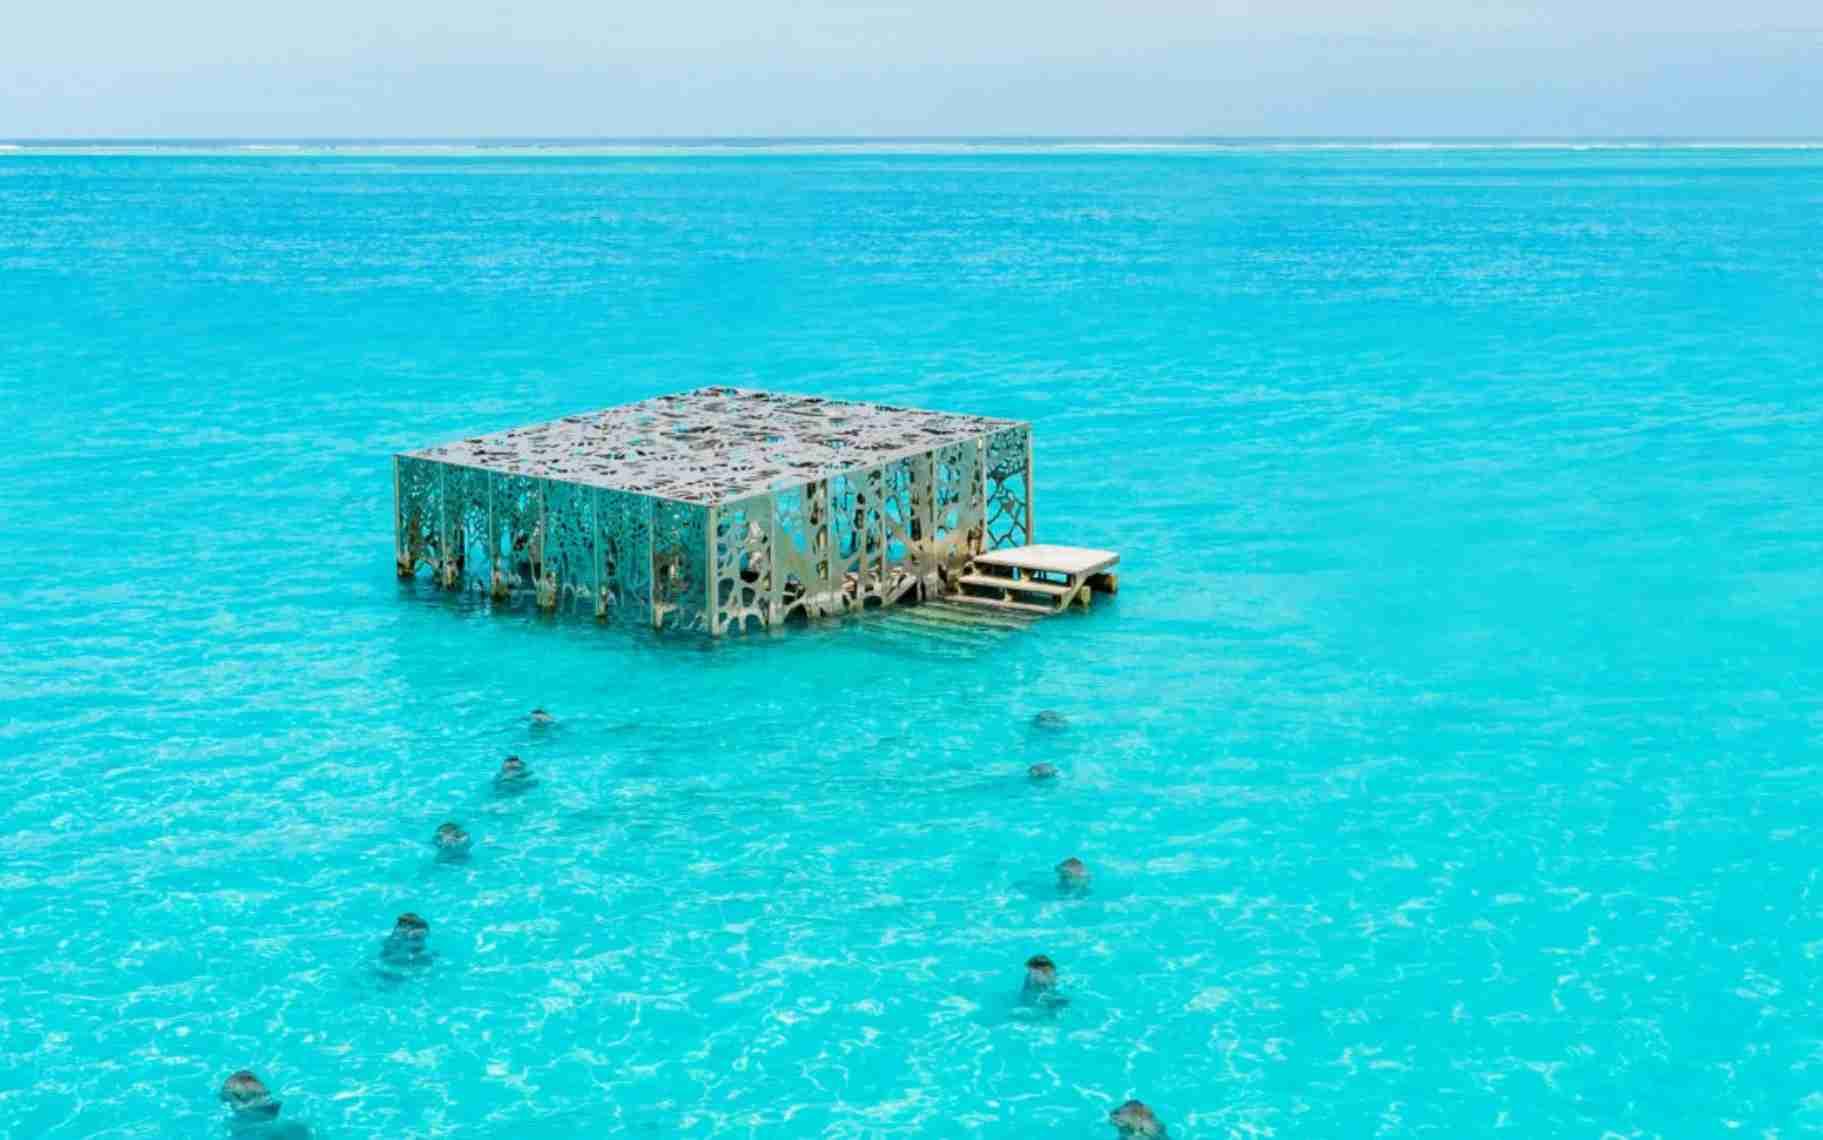 (Photo courtesy of the Fairmont Maldives)